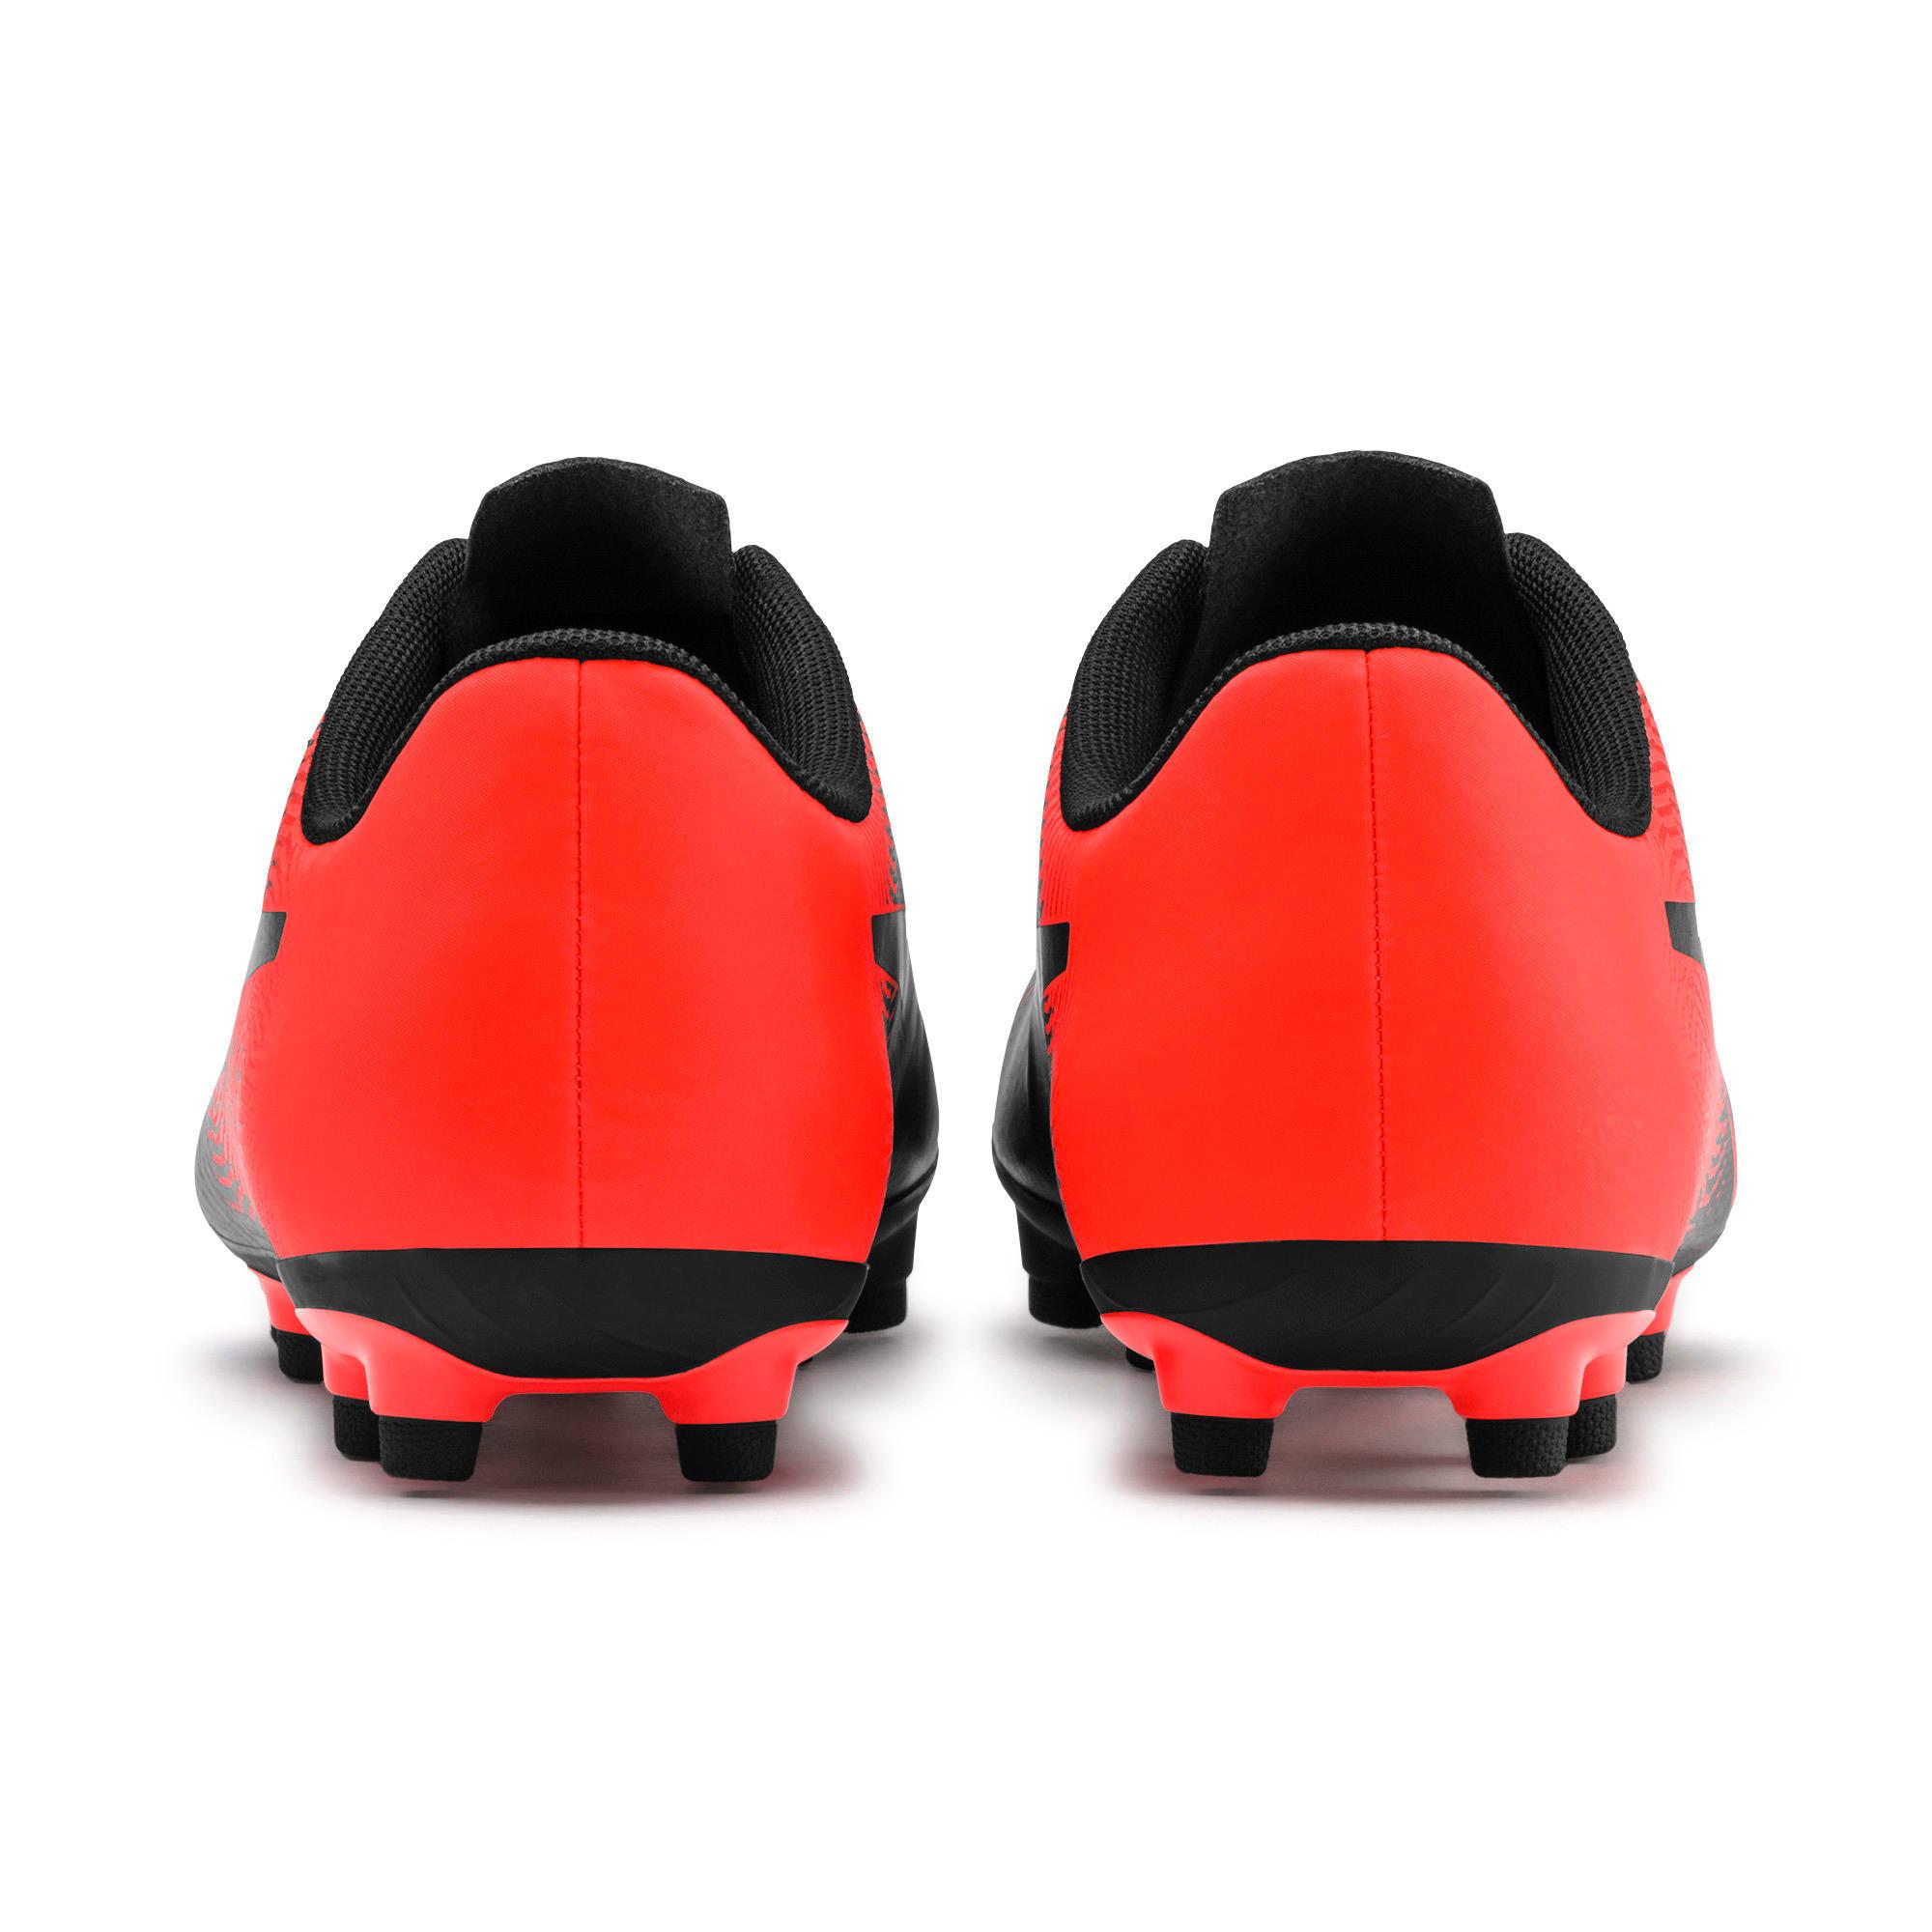 Thumbnail 5 of PUMA Spirit II FG Men's Football Boots, Puma Black-Nrgy Red, medium-IND